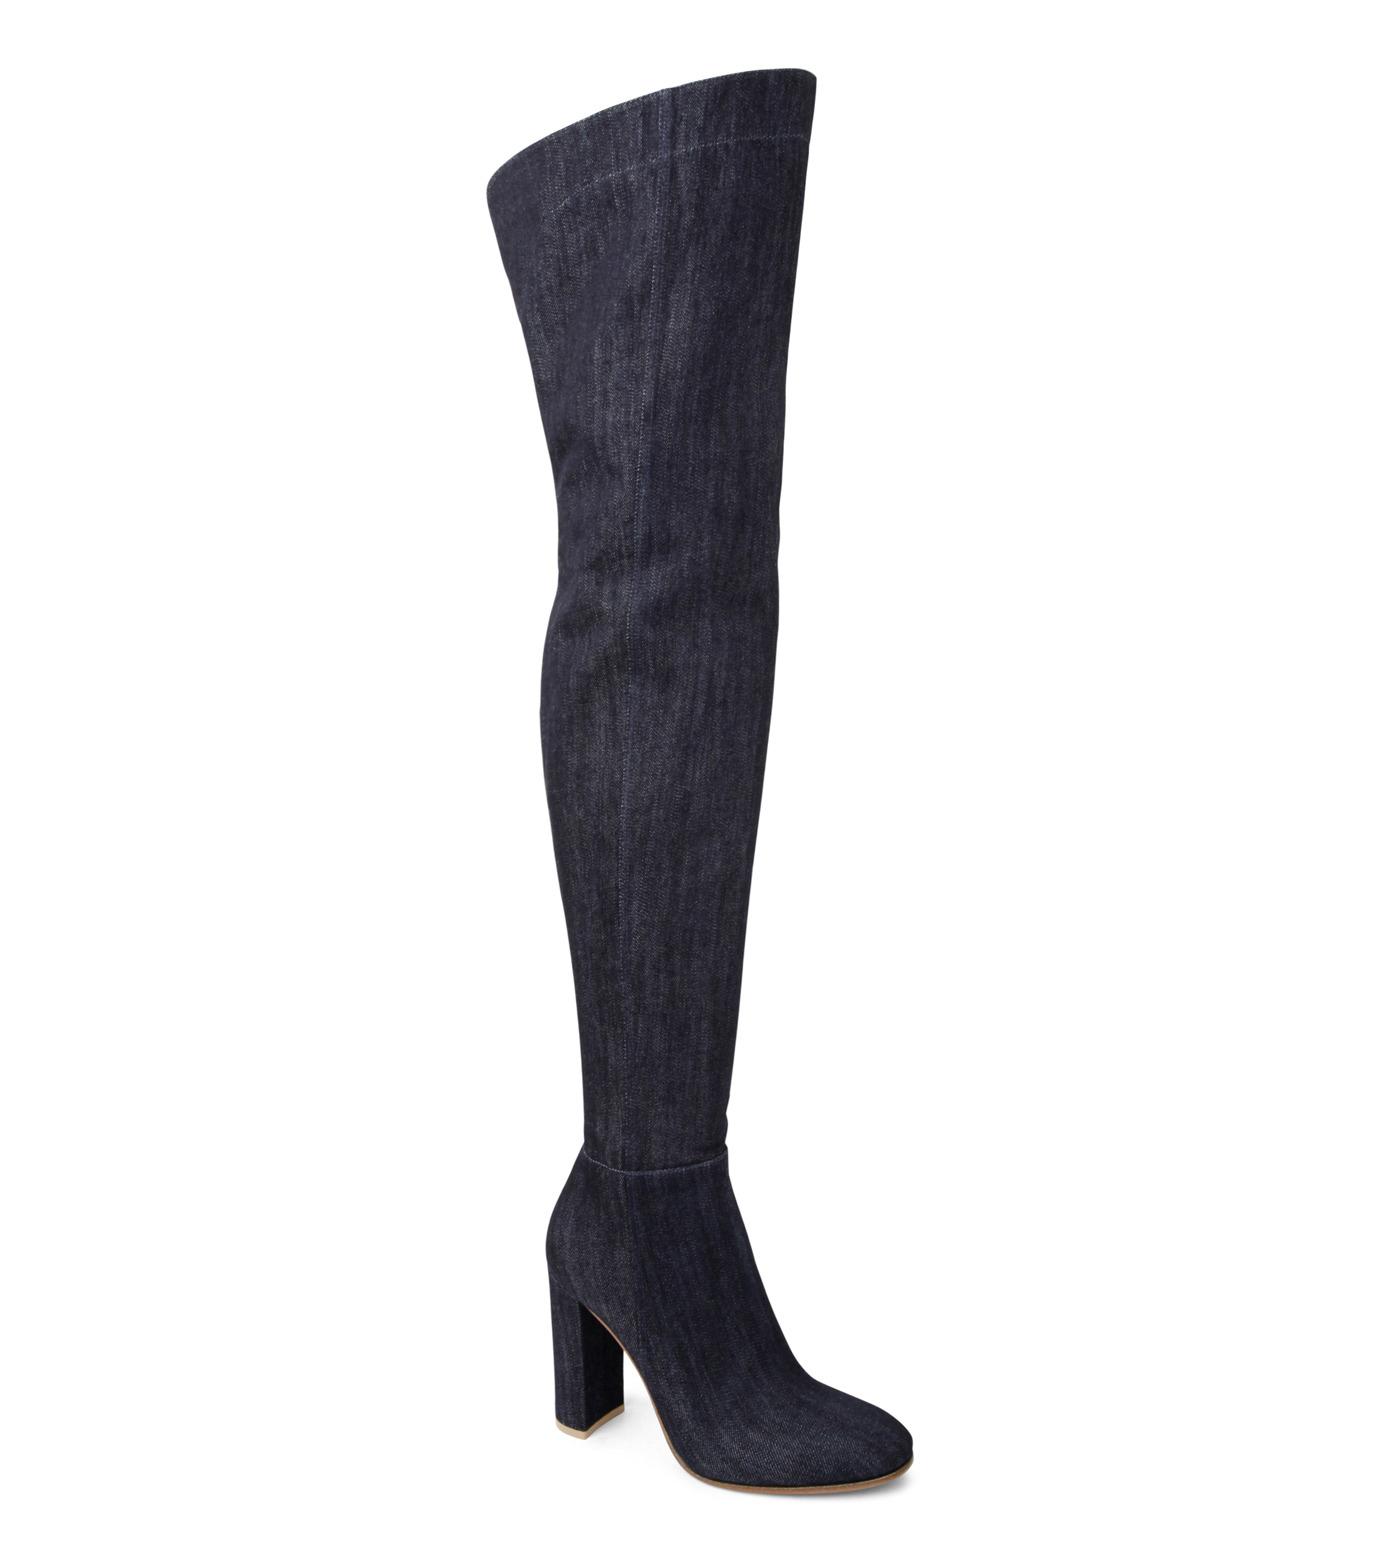 Gianvito Rossi(ジャンヴィト ロッシ)のDenim Over the Knee Boots-INDIGO(ブーツ/boots)-G80806-94 拡大詳細画像1